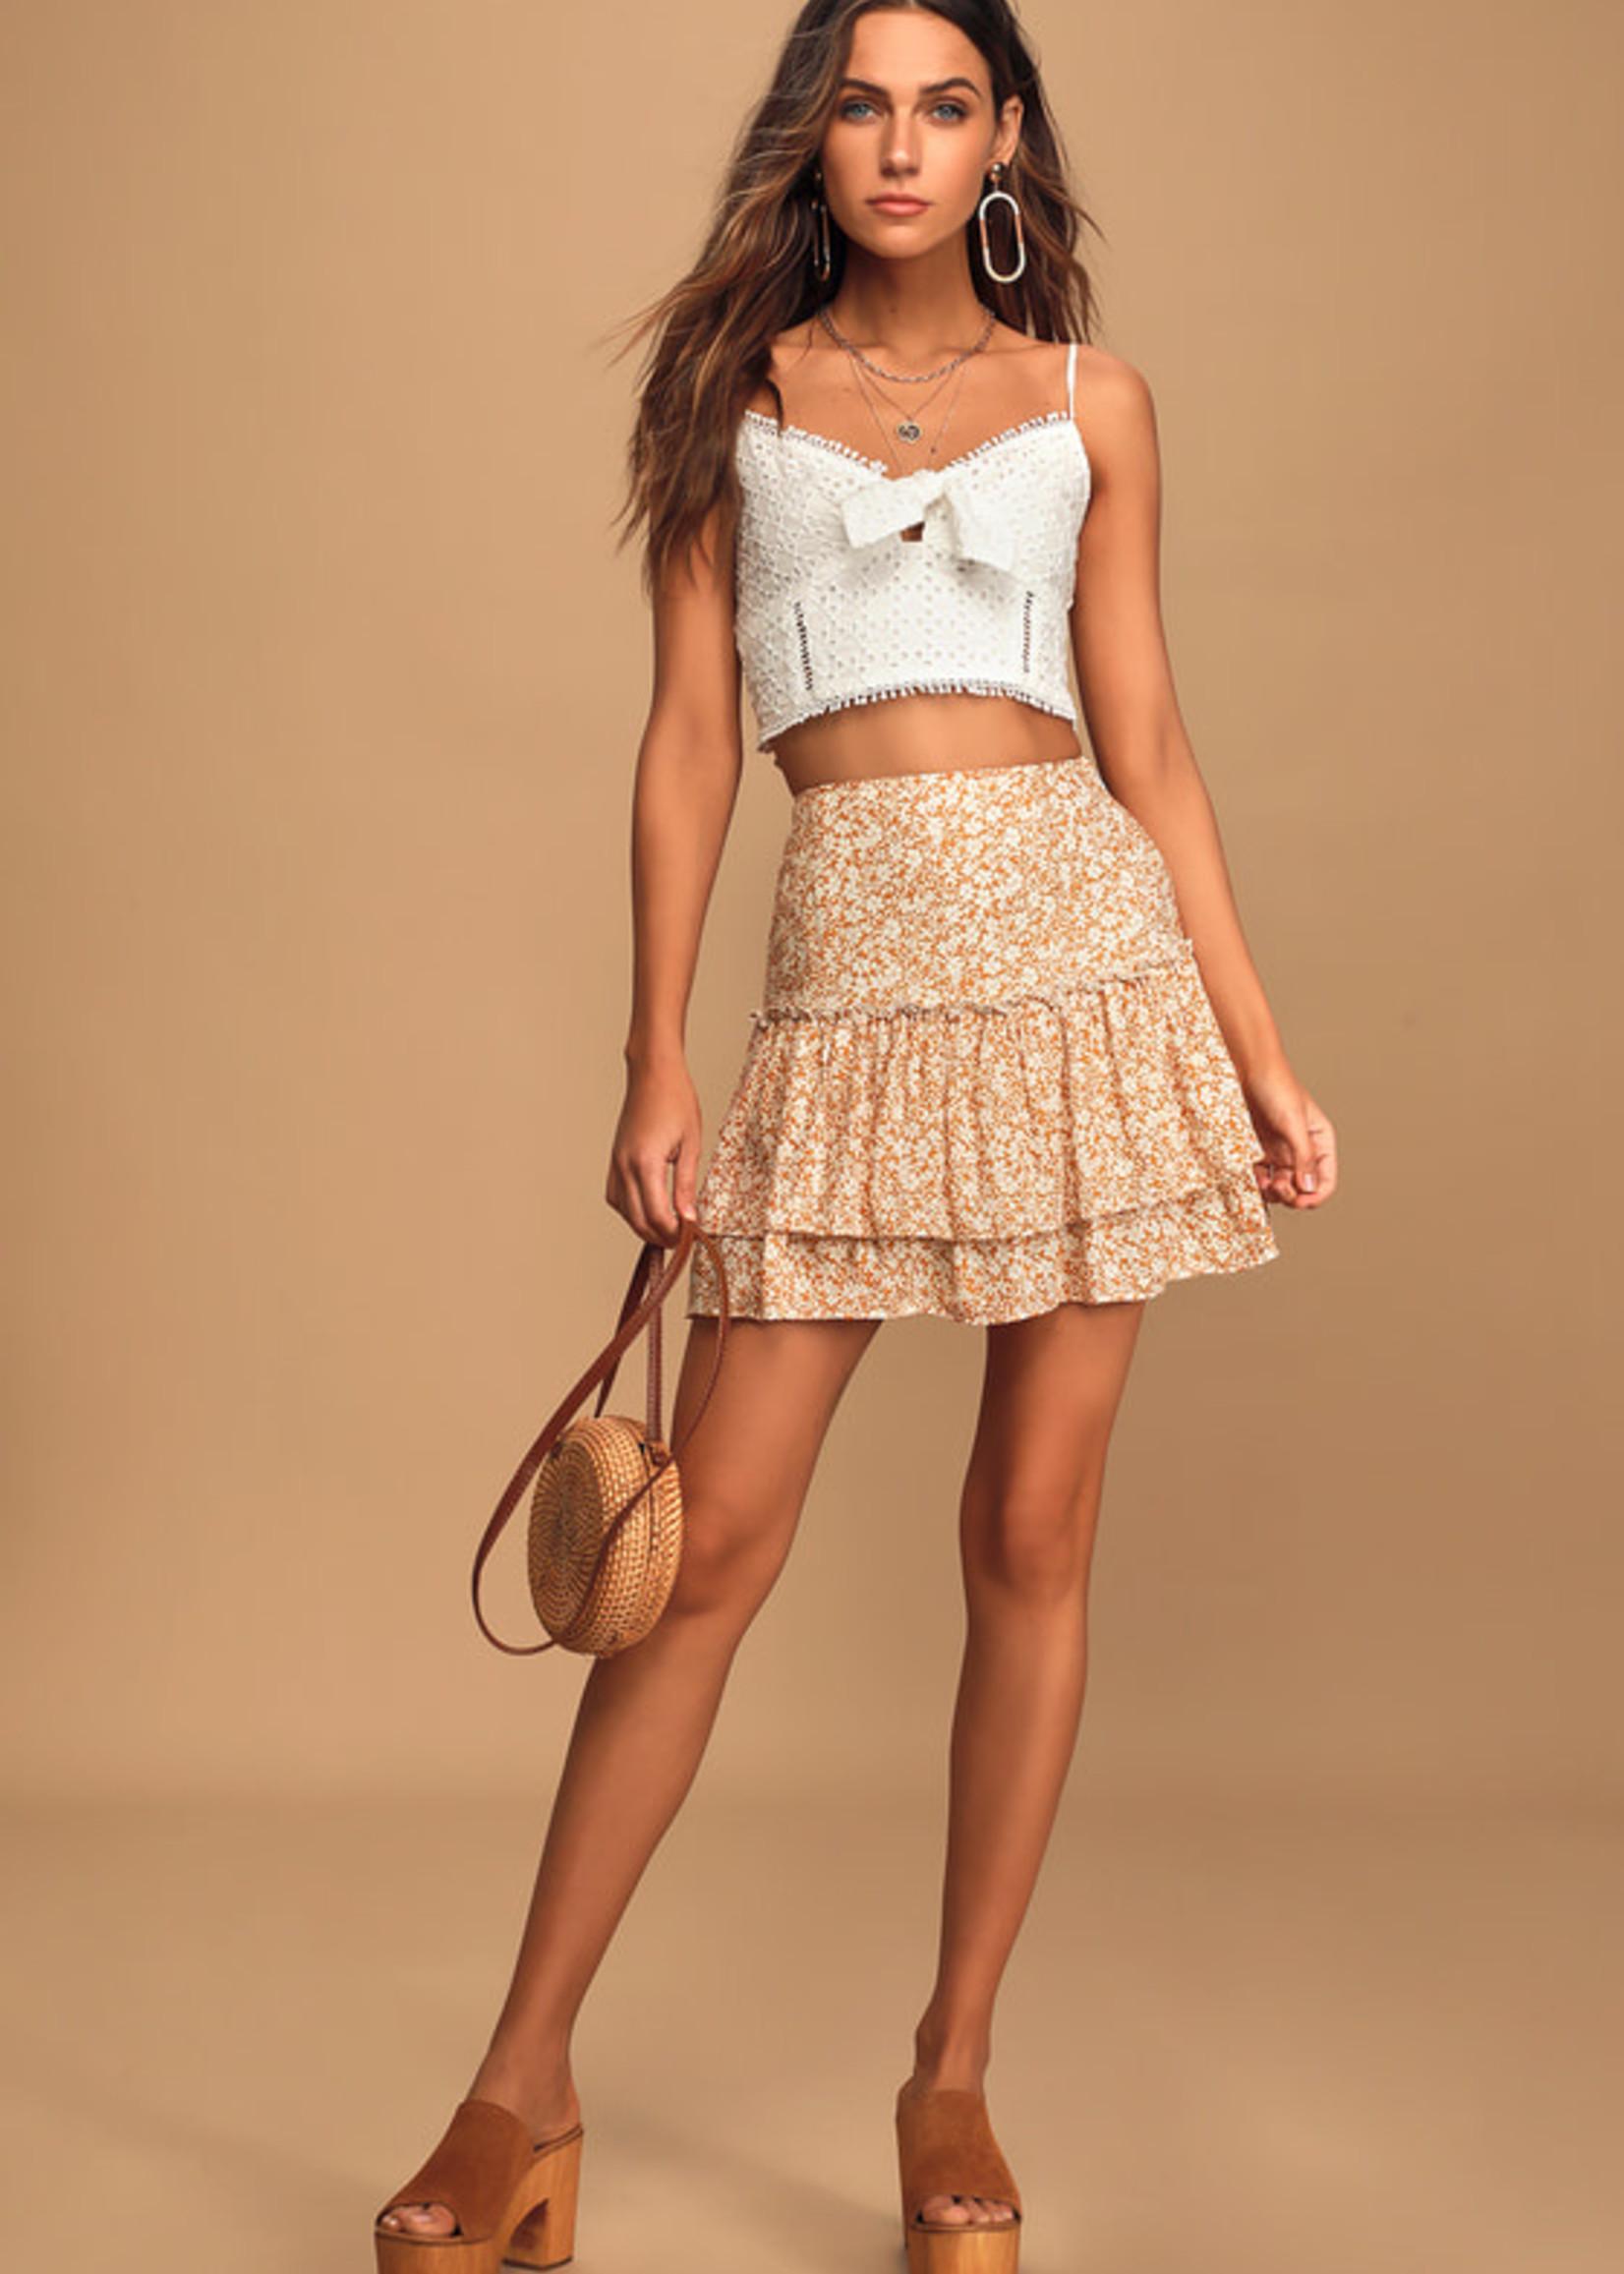 SAGE the LABEL WILD HONEY skirt